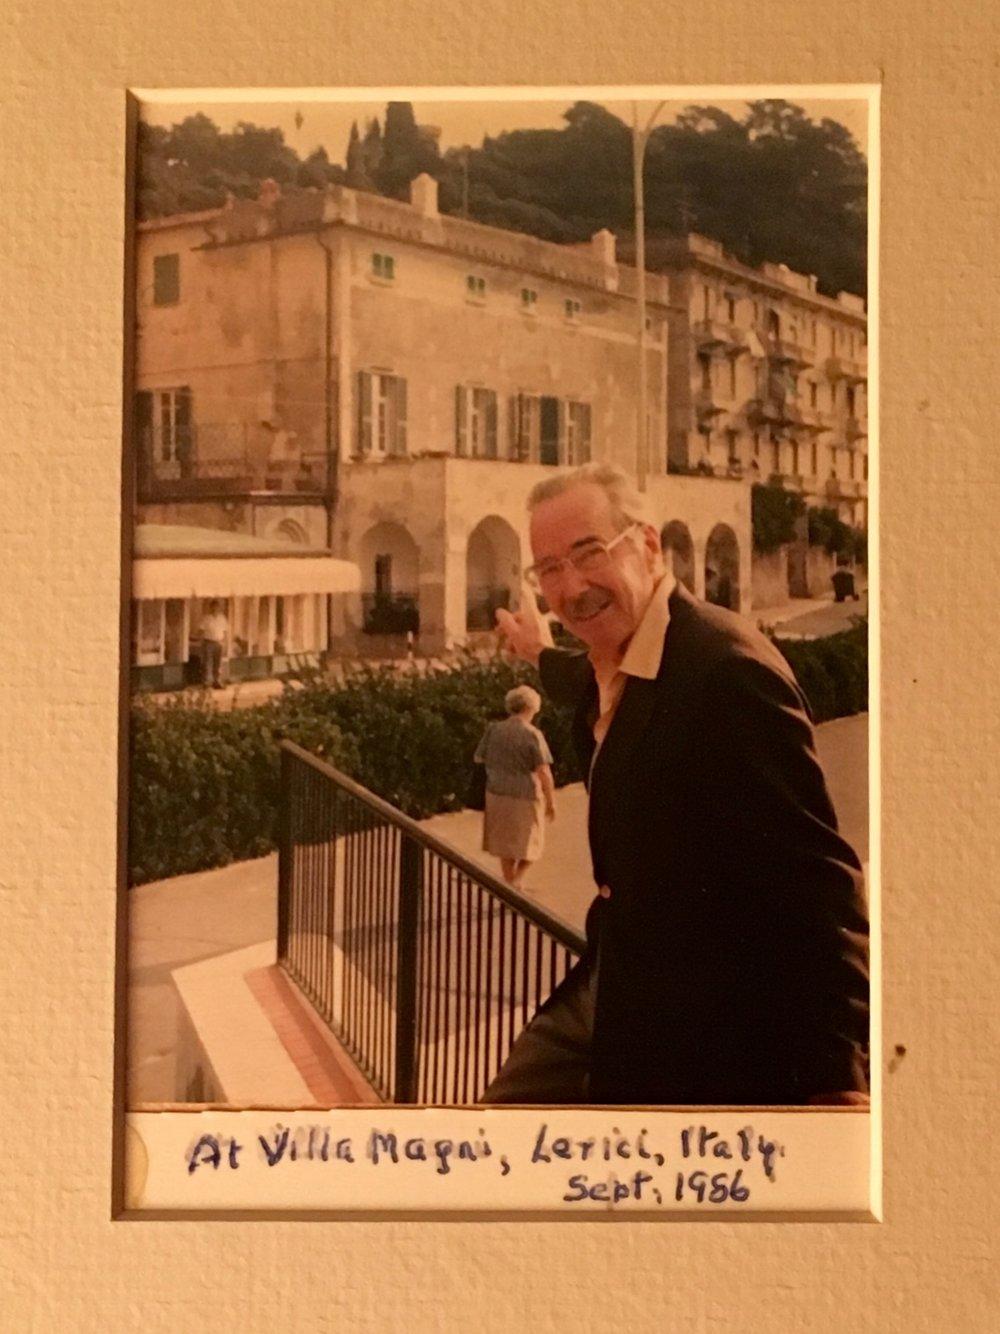 Larry Henderson at Casa Magni, Lerici, Italy, September 1986